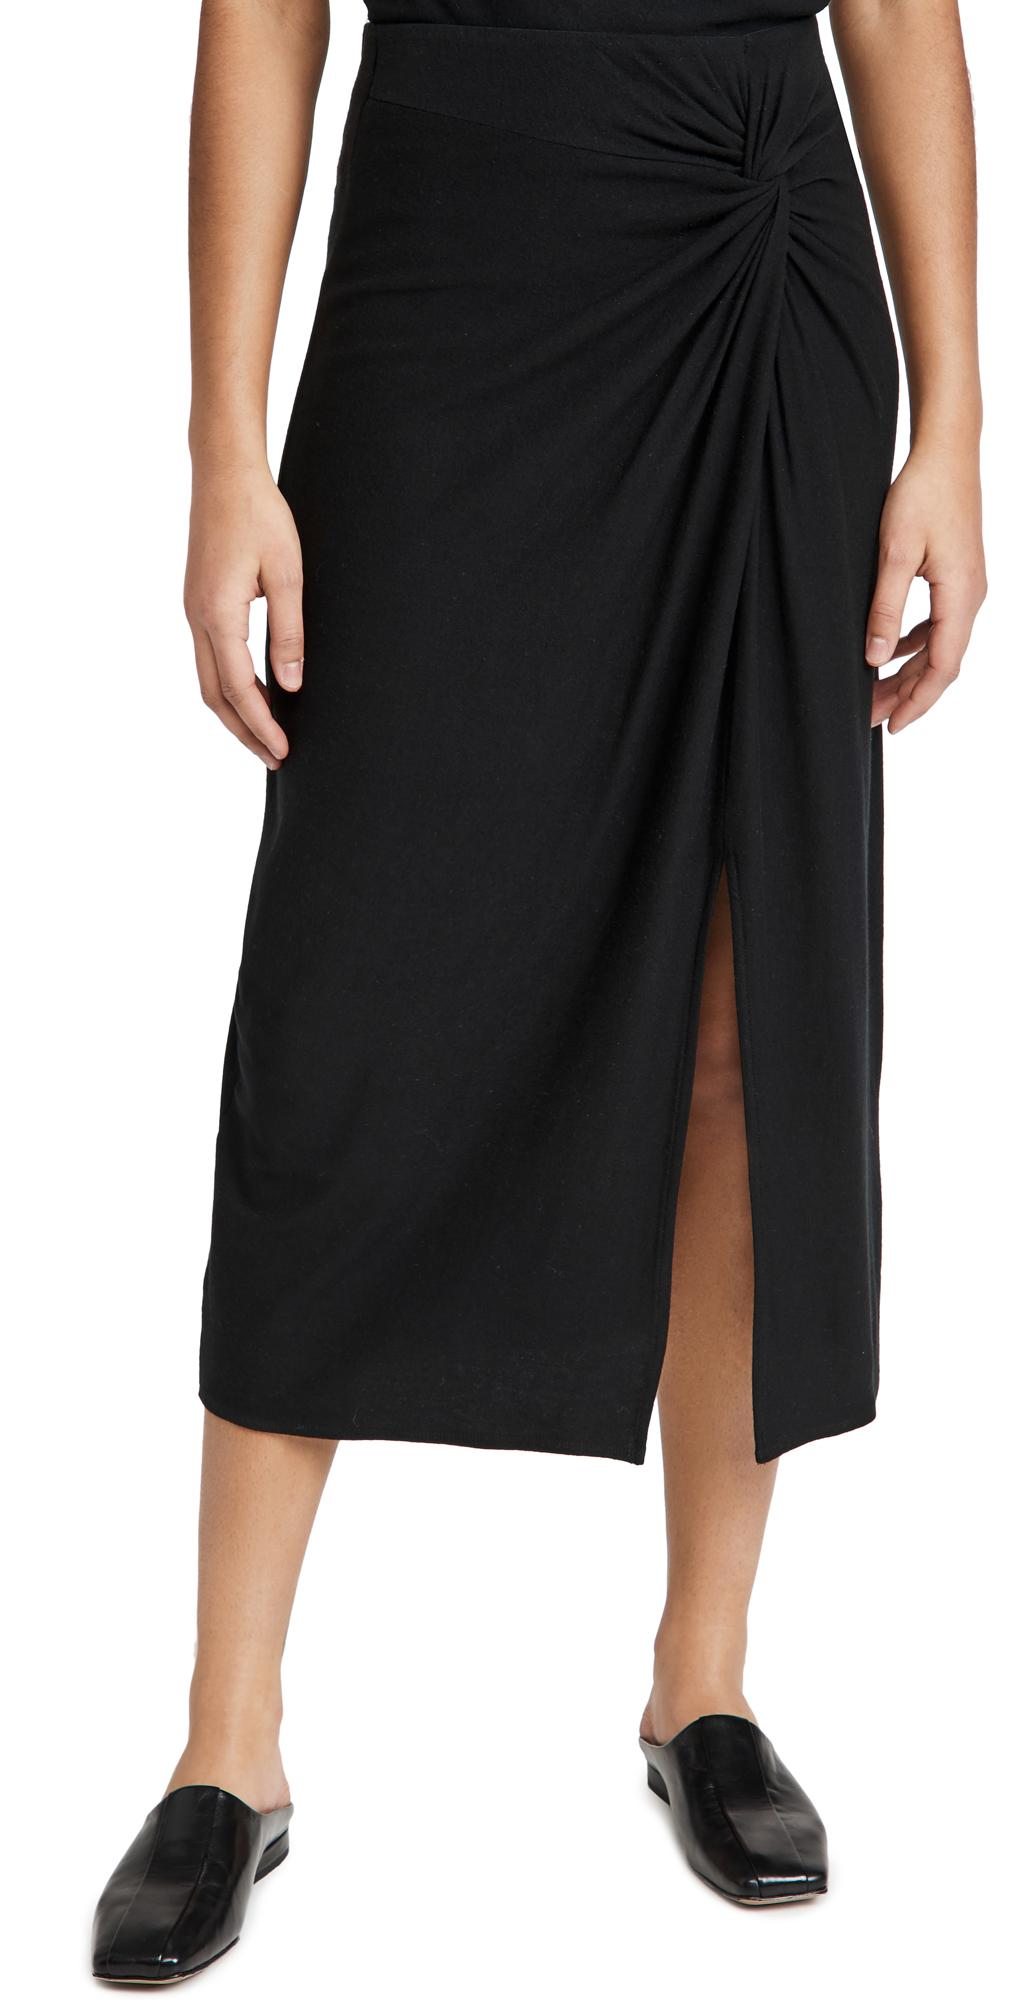 Vince Twist Draped Skirt